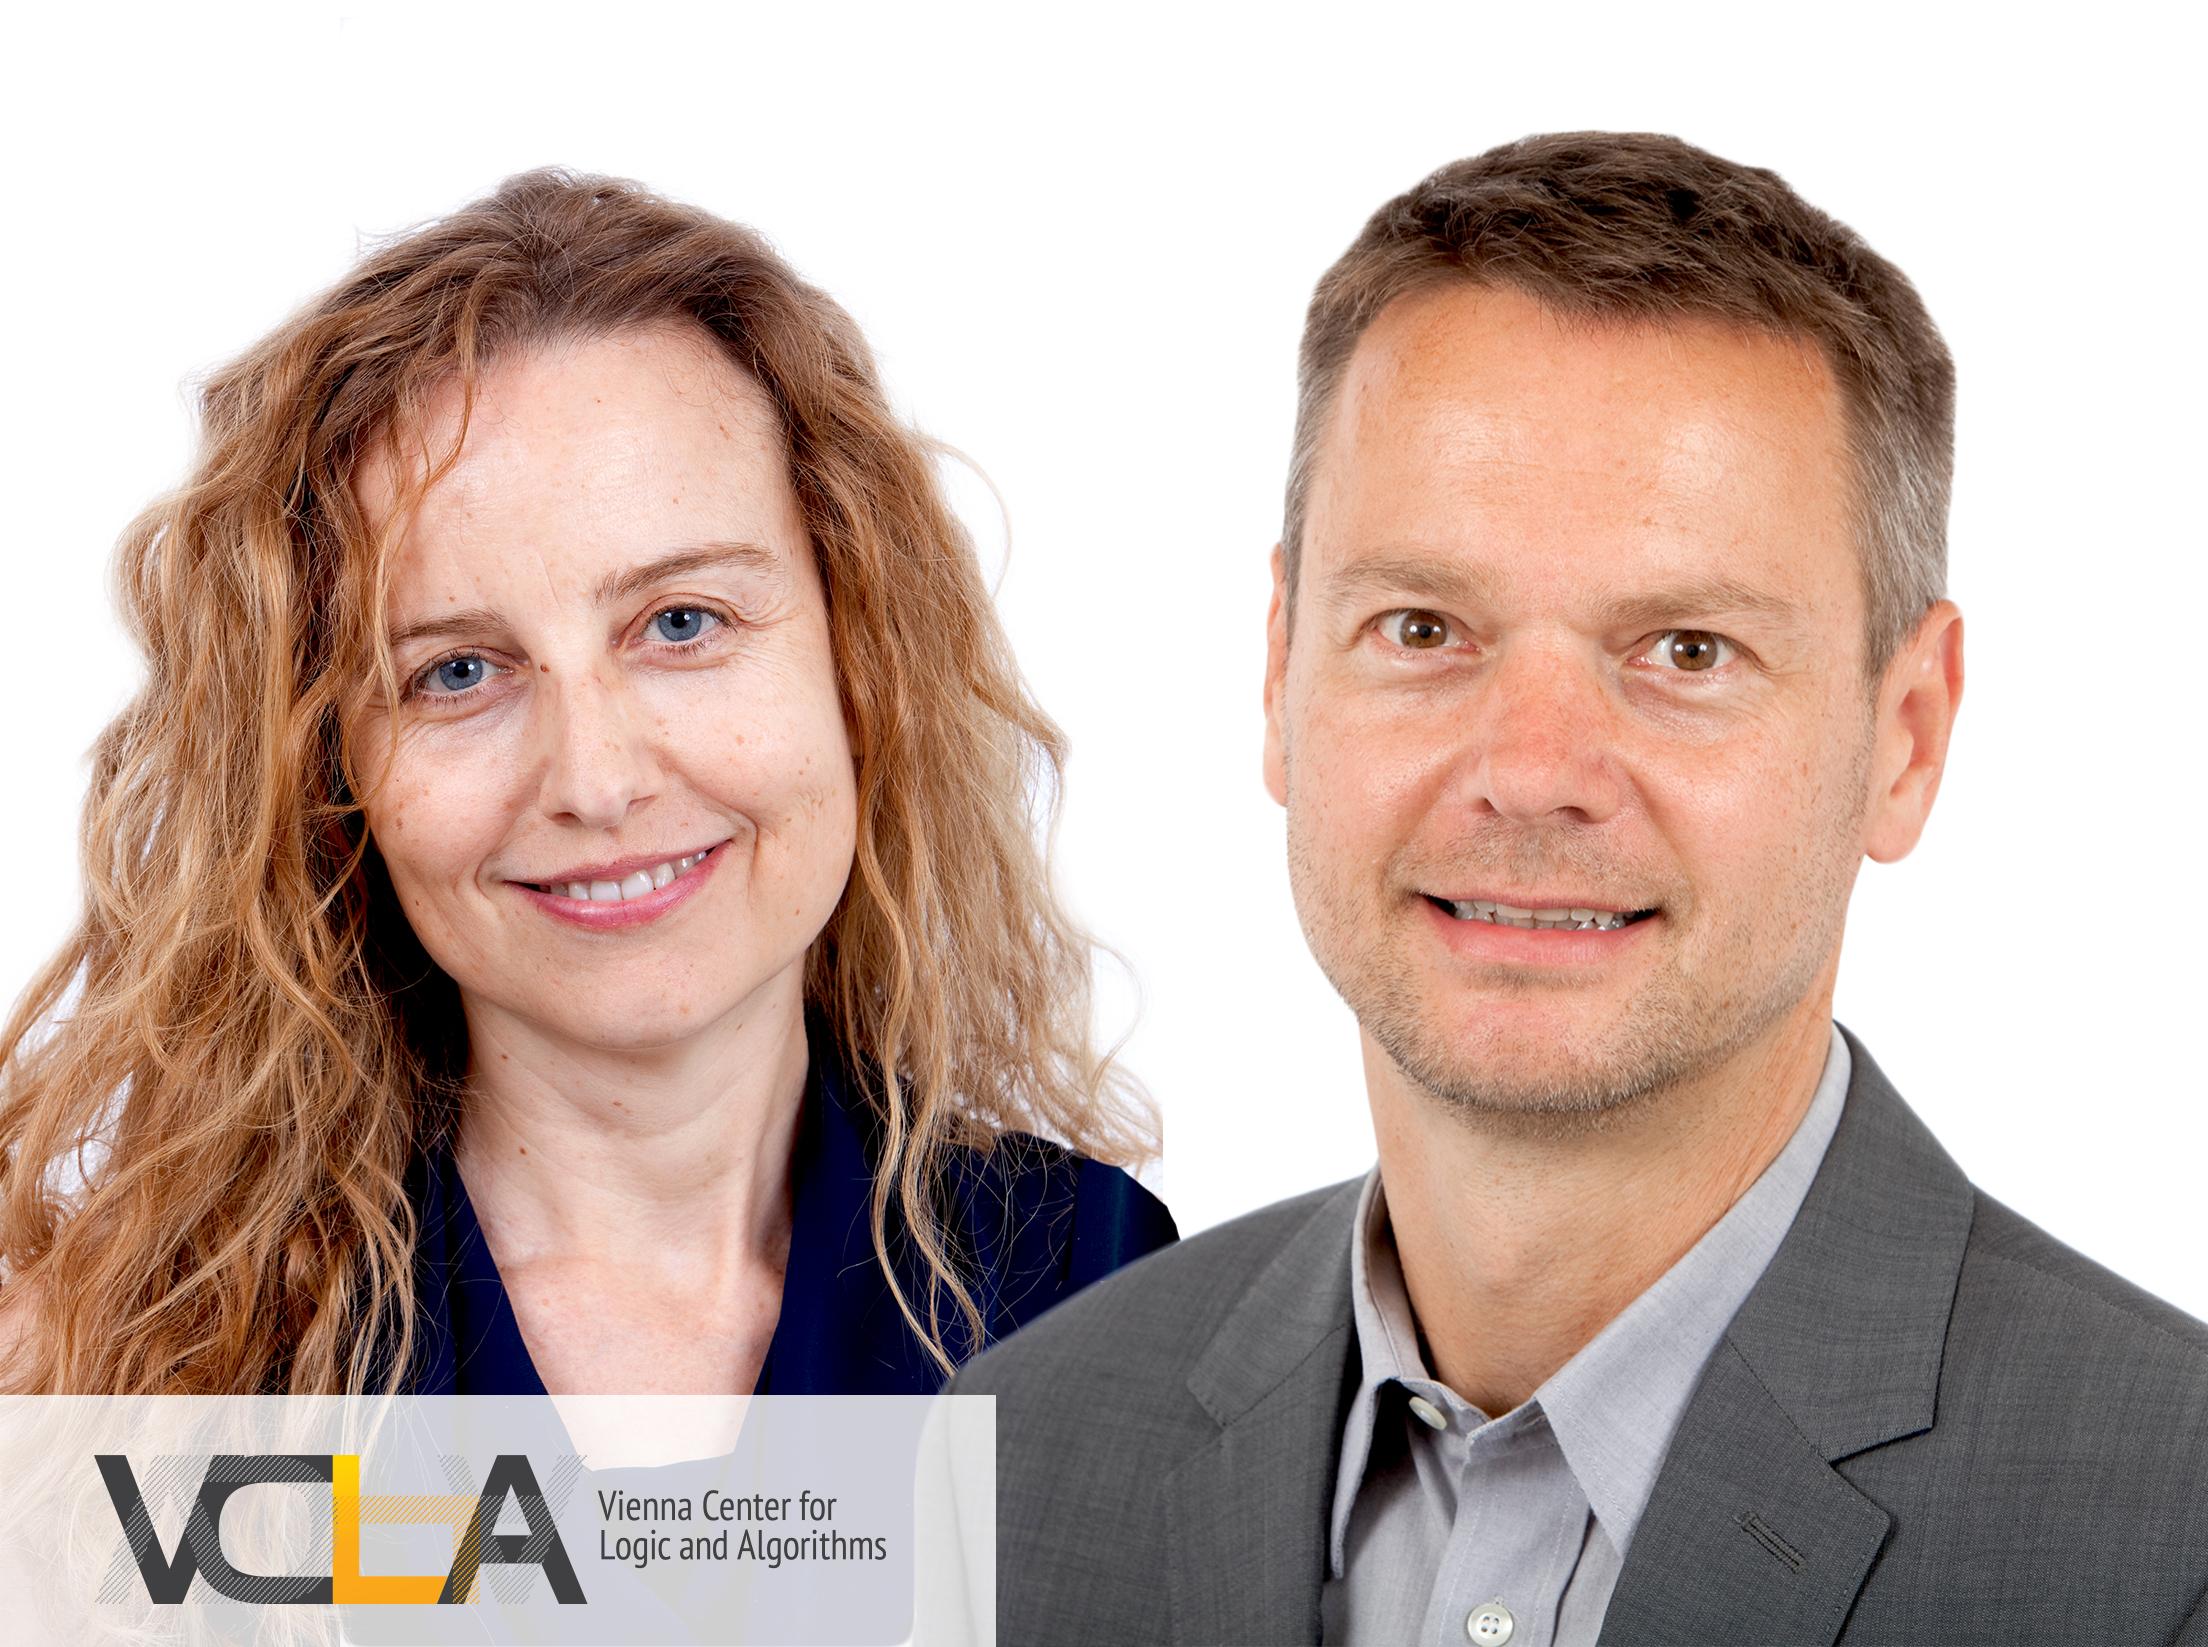 Agata Ciabattoni und Stefan Szeider